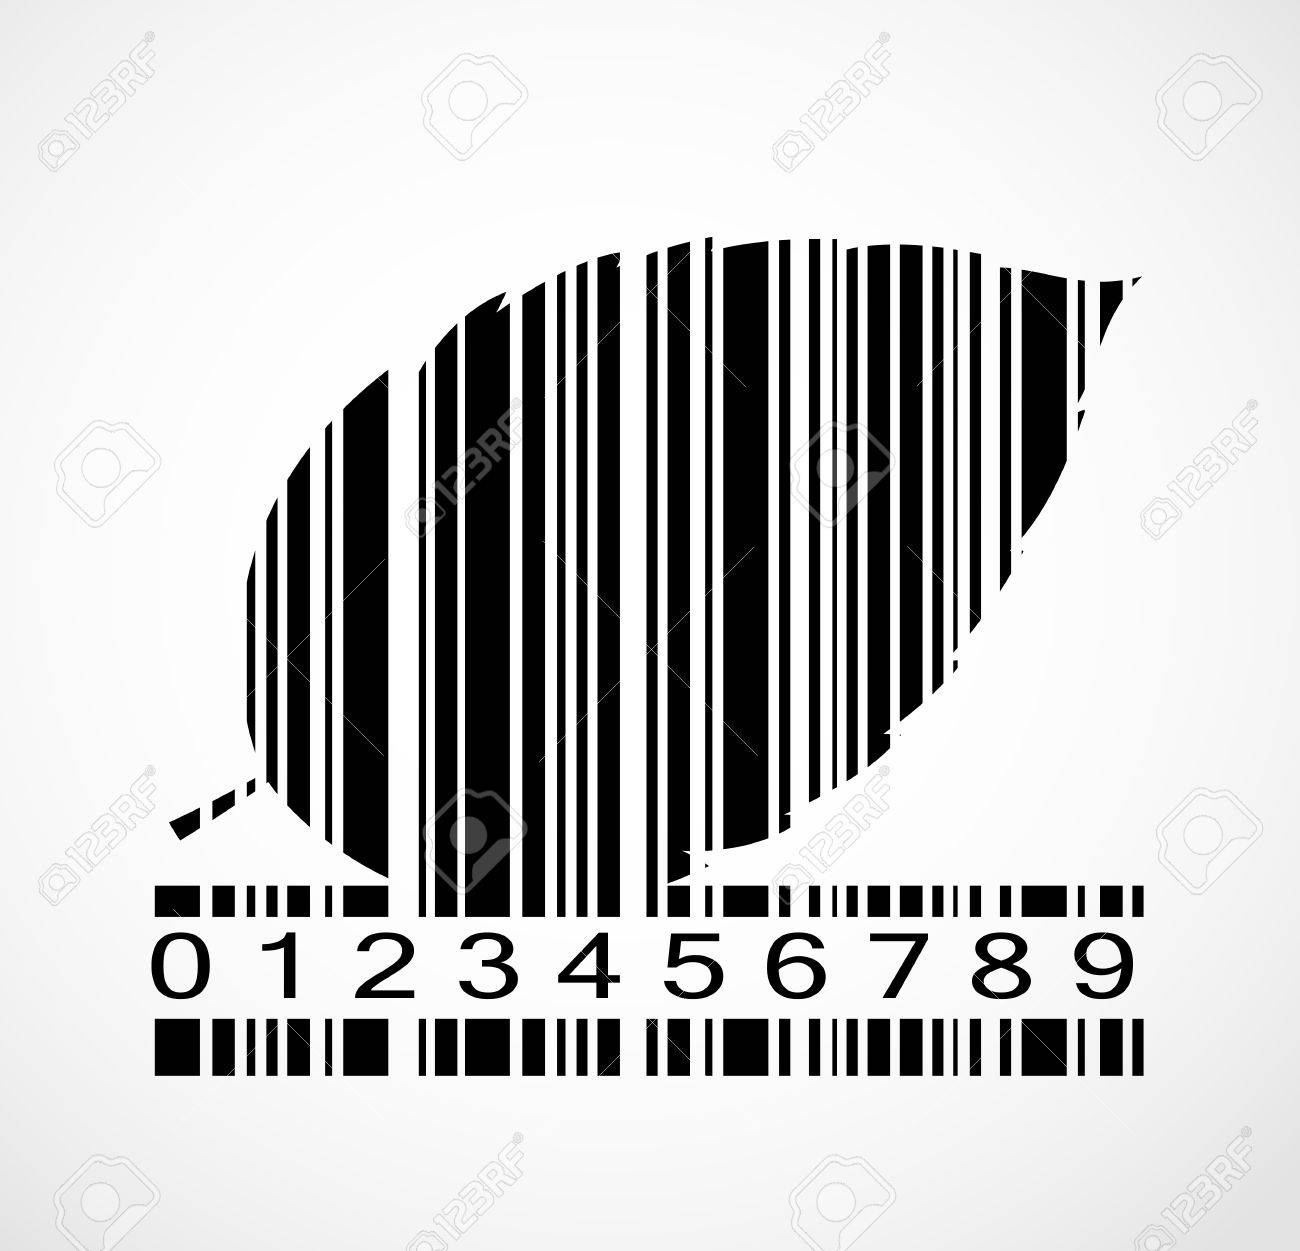 barcode autumn leaf image vector illustration eps10 royalty free